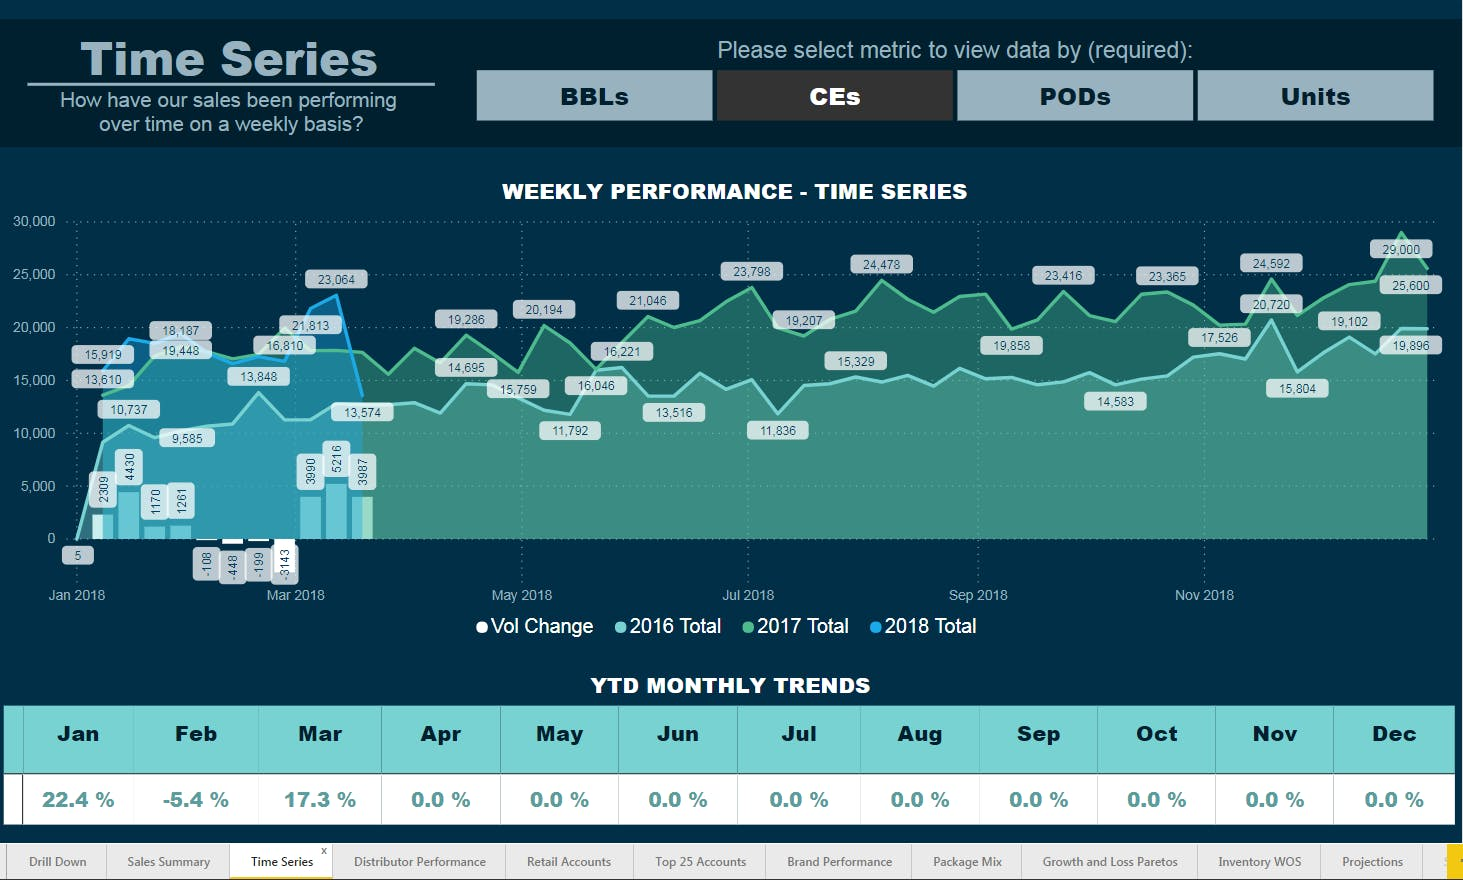 Key performance indicators time series